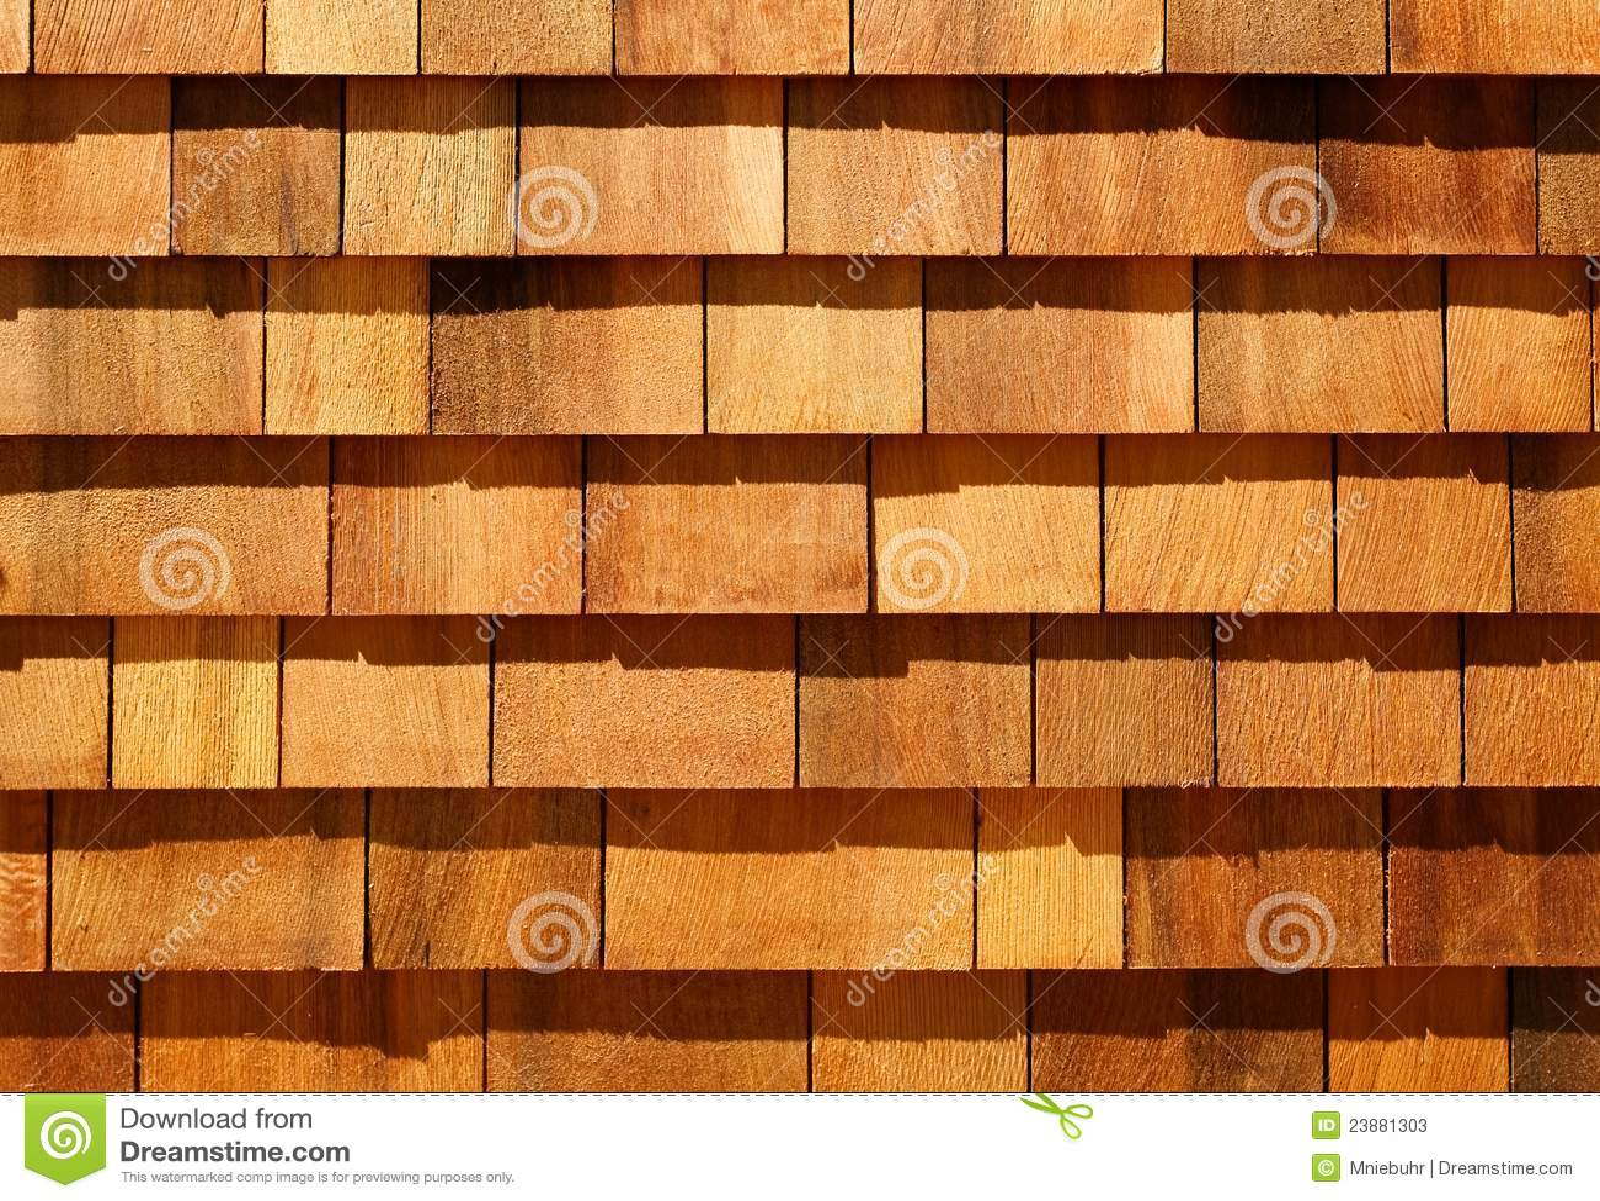 Western Red Cedar Wood Shingles As Wall Siding Stock Image